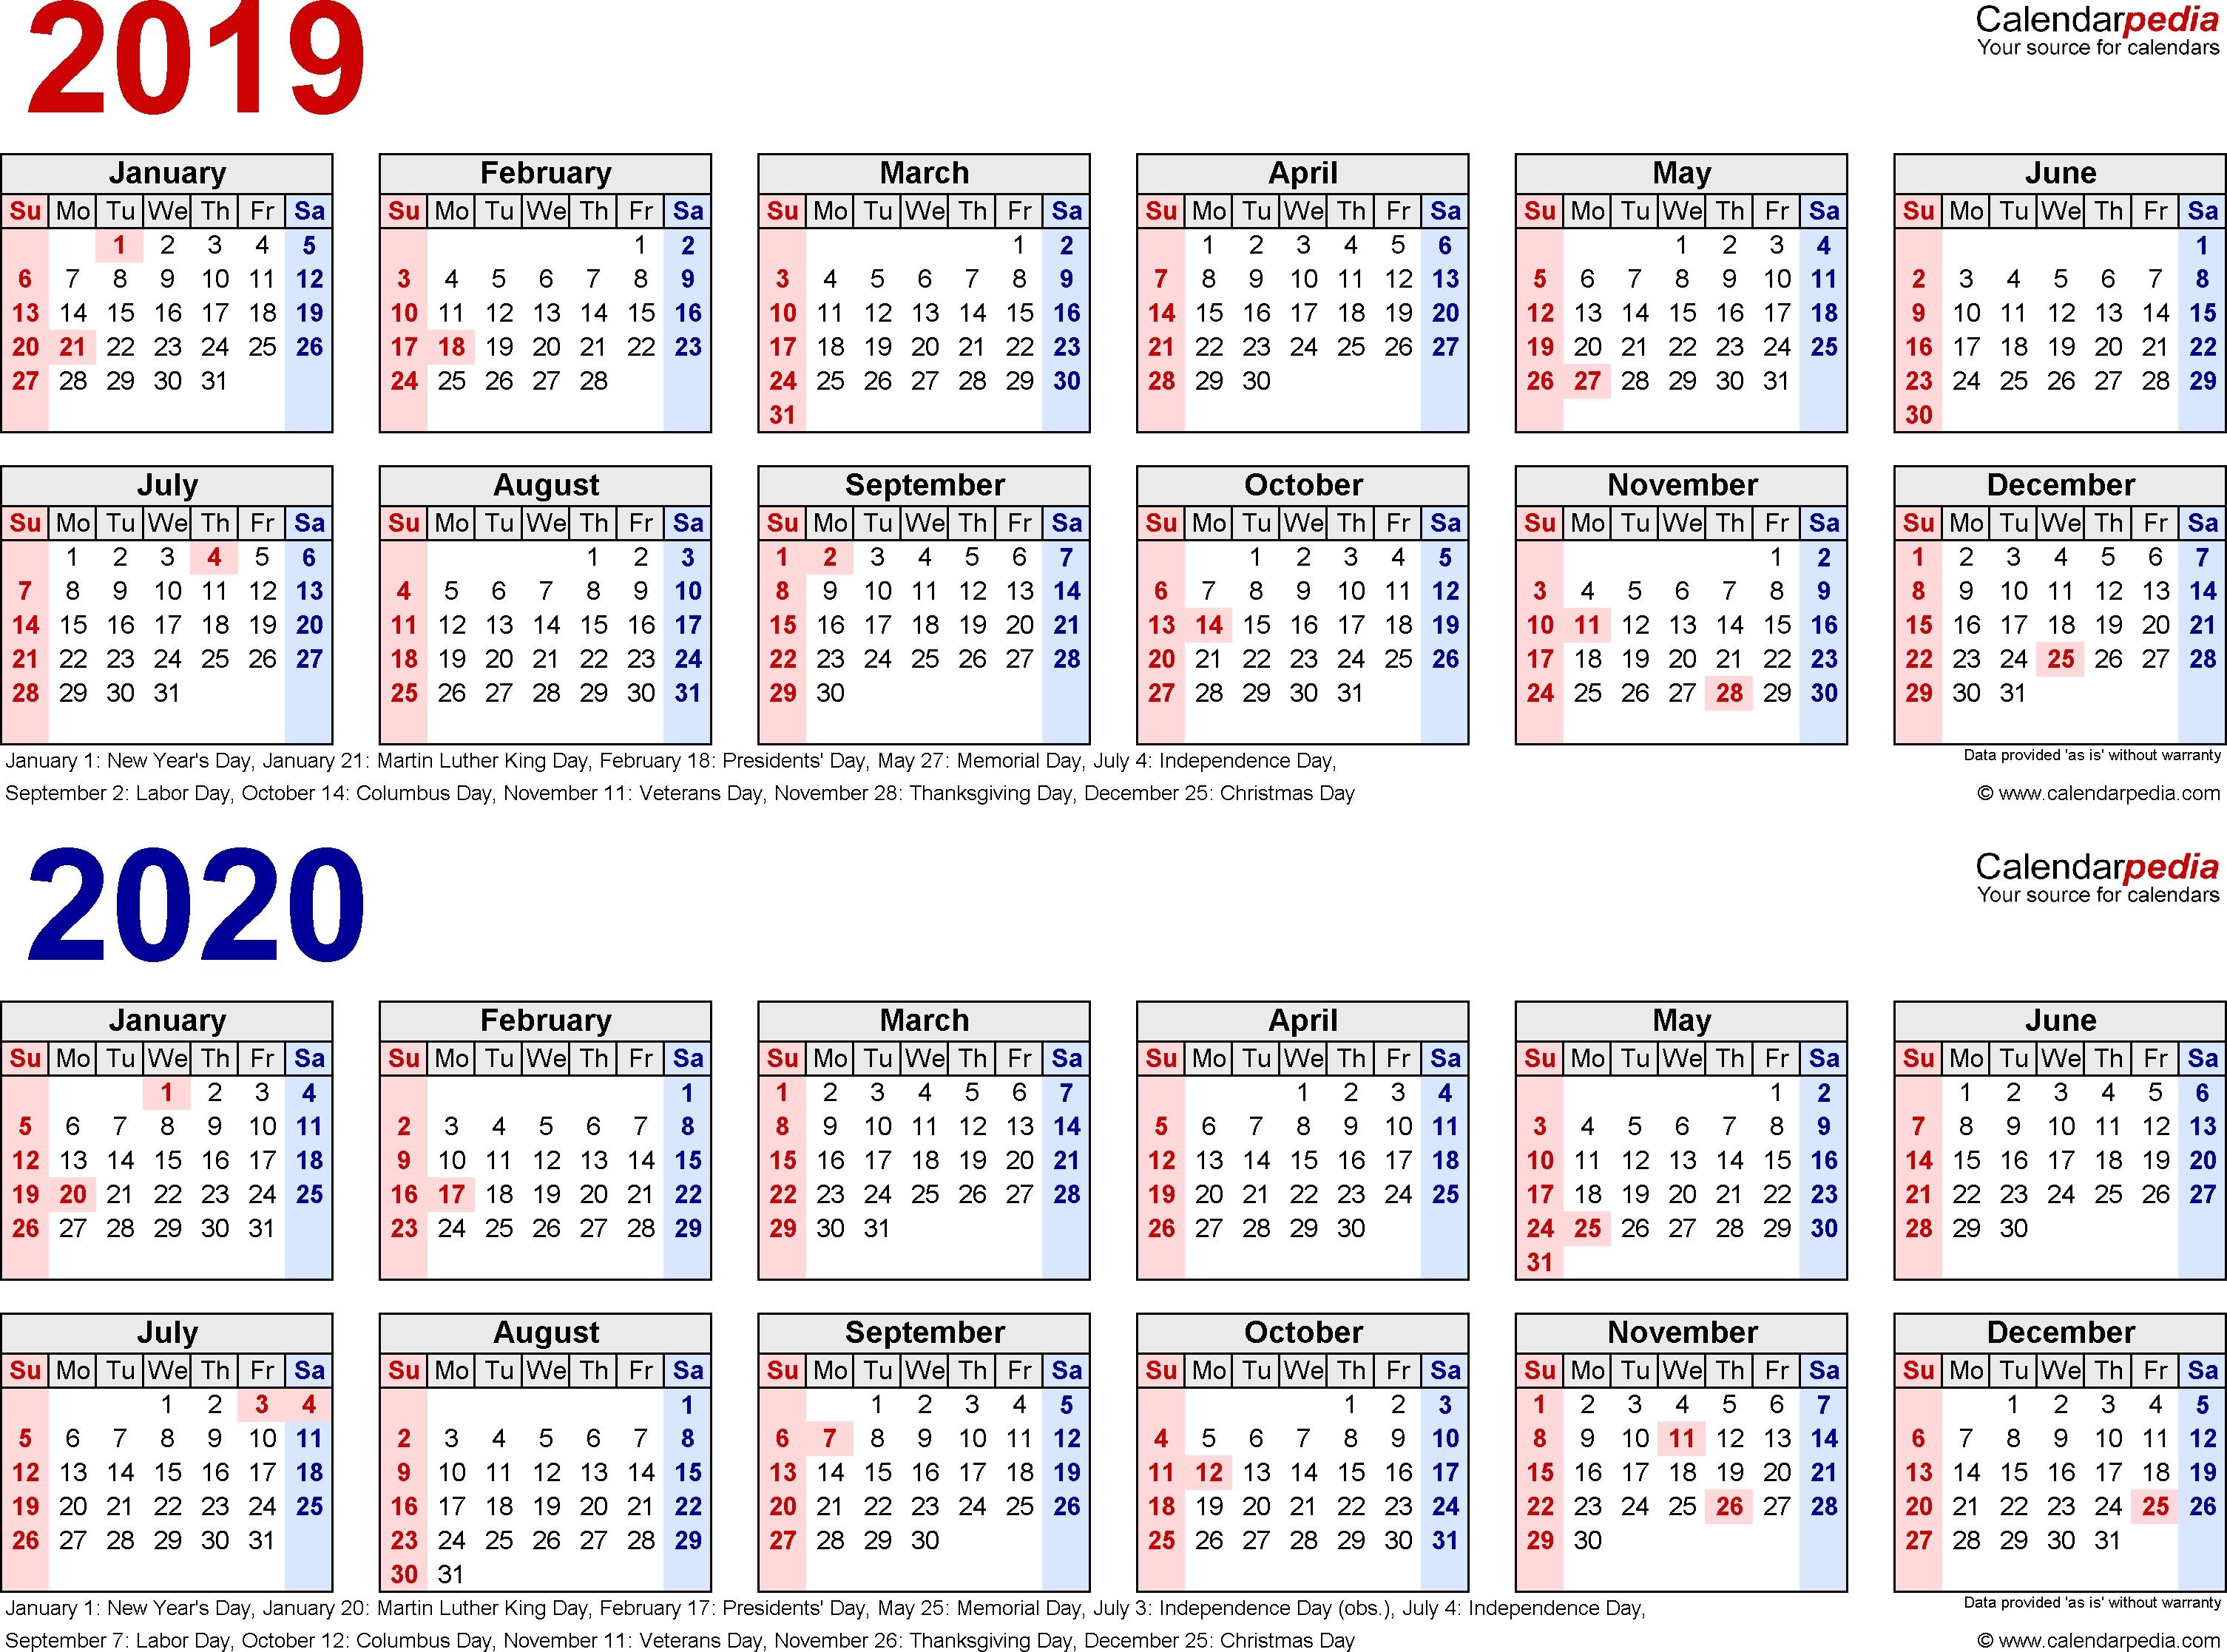 2019-2020 Calendar - Free Printable Two-Year Pdf Calendars-2 Page Monthly Calendar 2020 Printable Free